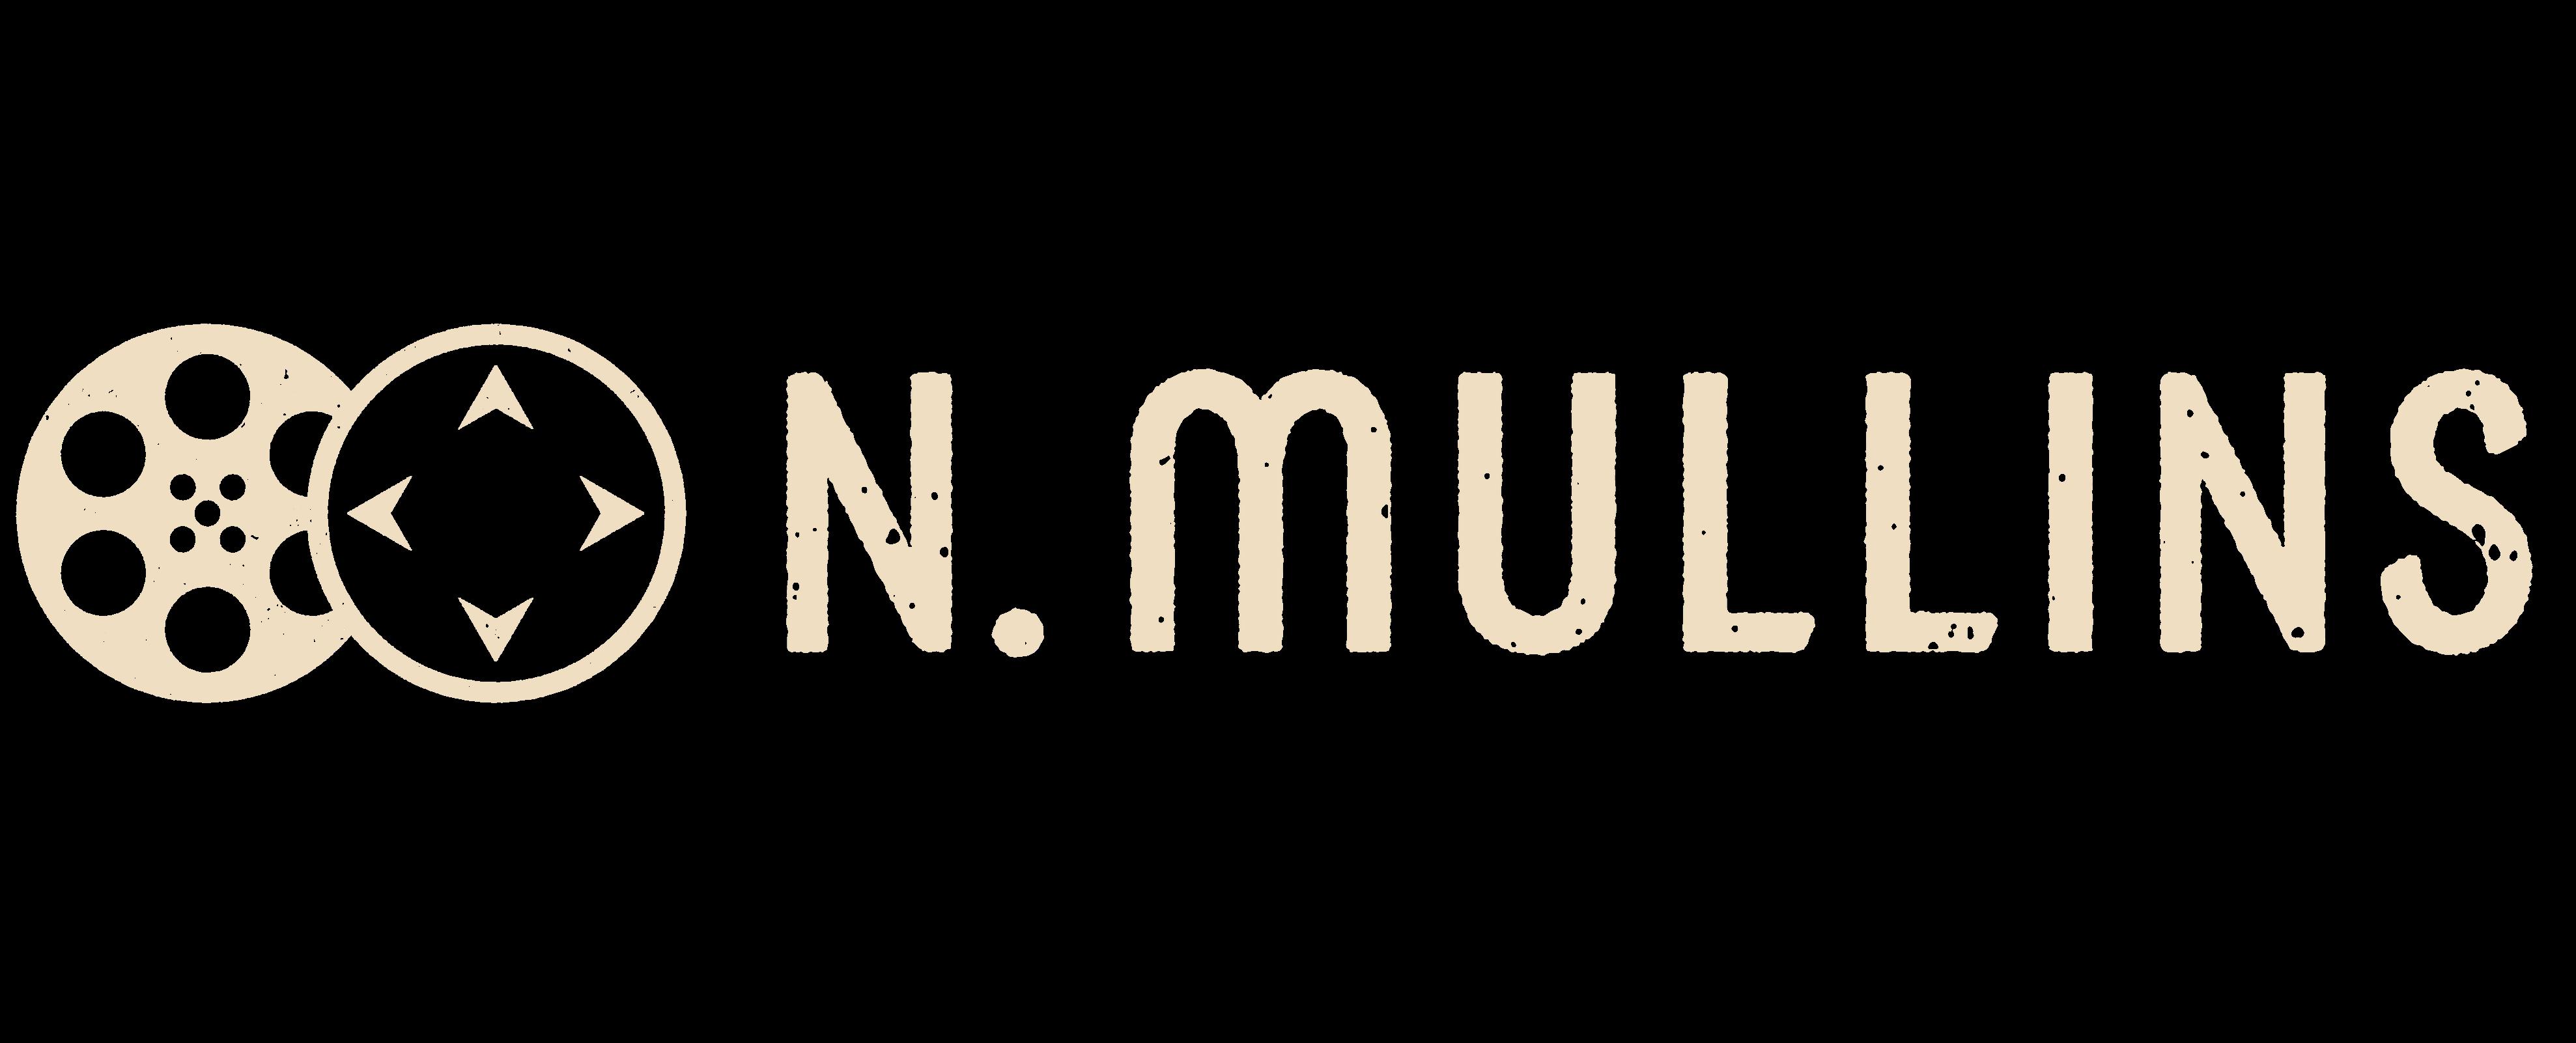 Nicholas Mullins